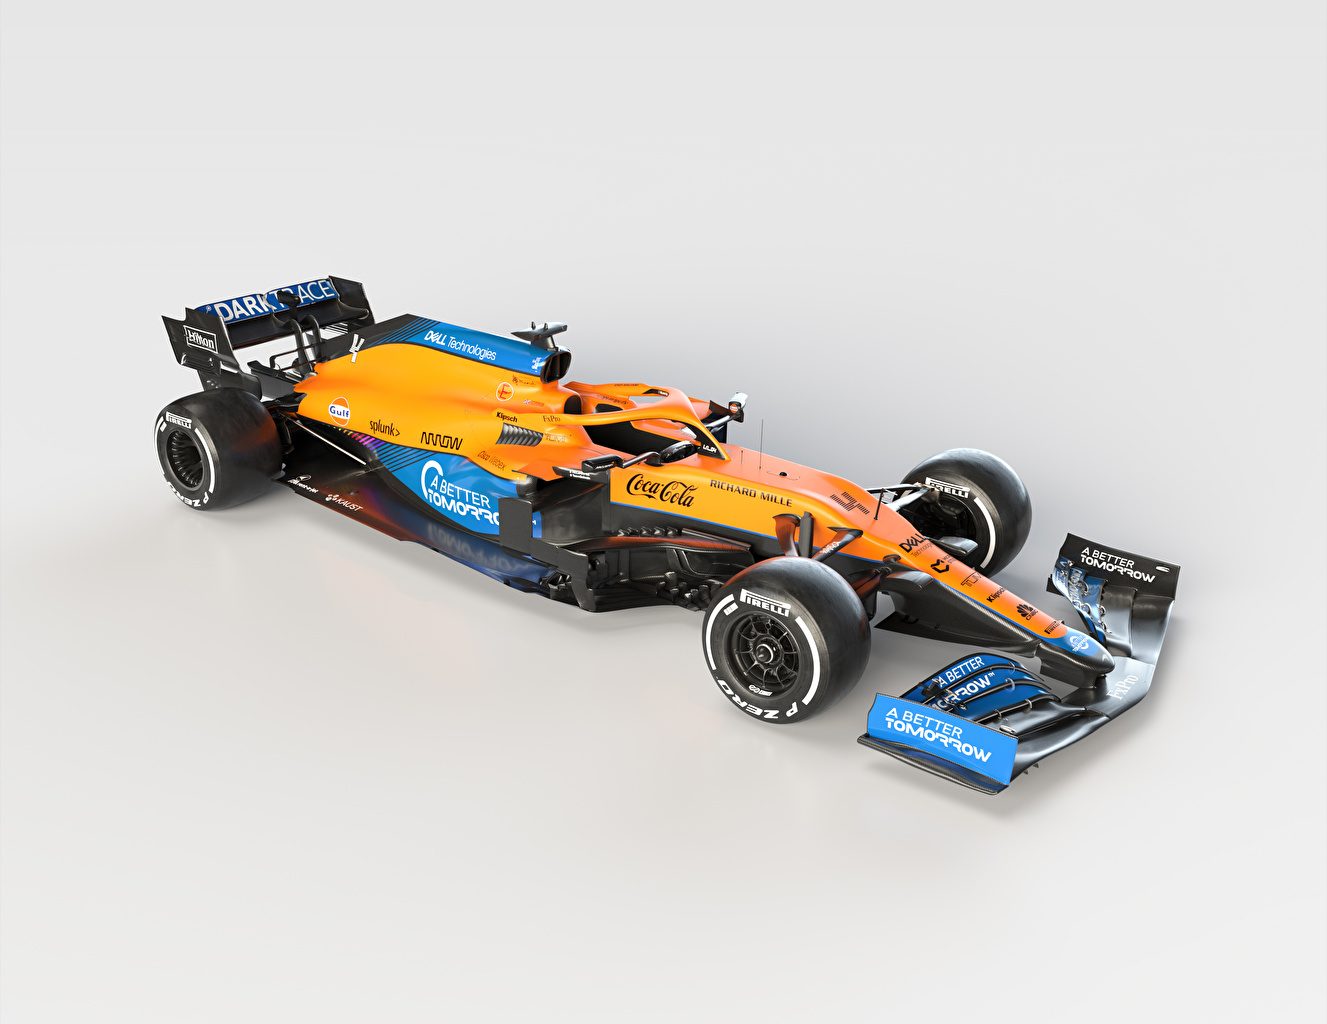 Fotos Tuning McLaren 2021 MCL35M Formel 1 Autos Grauer Hintergrund Fahrzeugtuning Formula 1 auto automobil